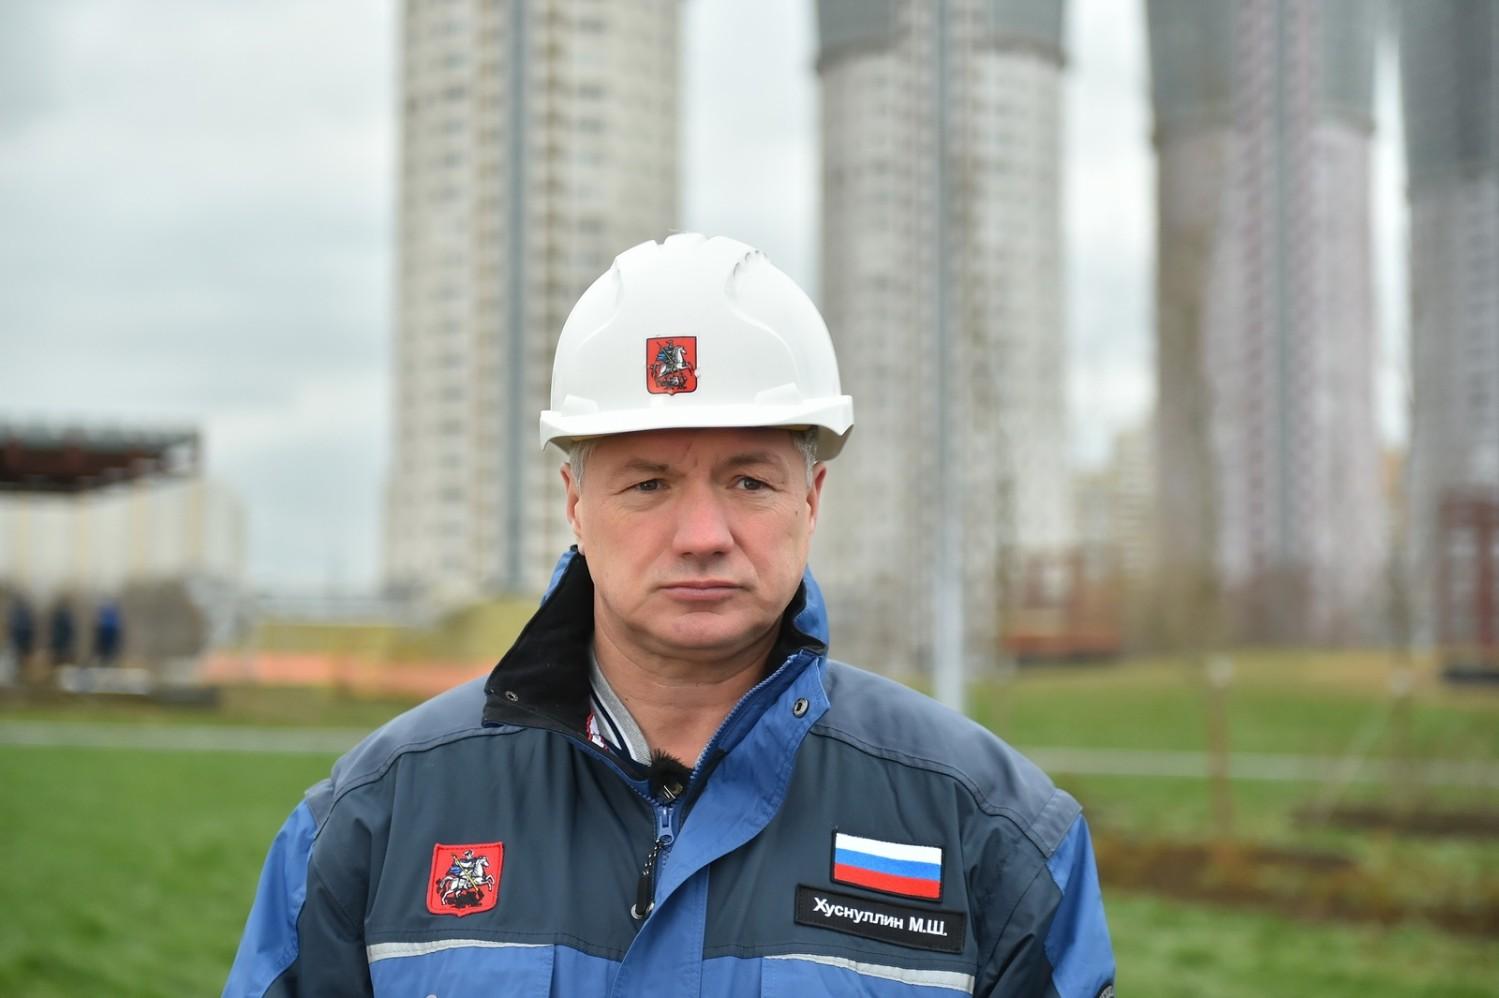 Марат Хуснуллин.Фото: www.stroi.mos.ru